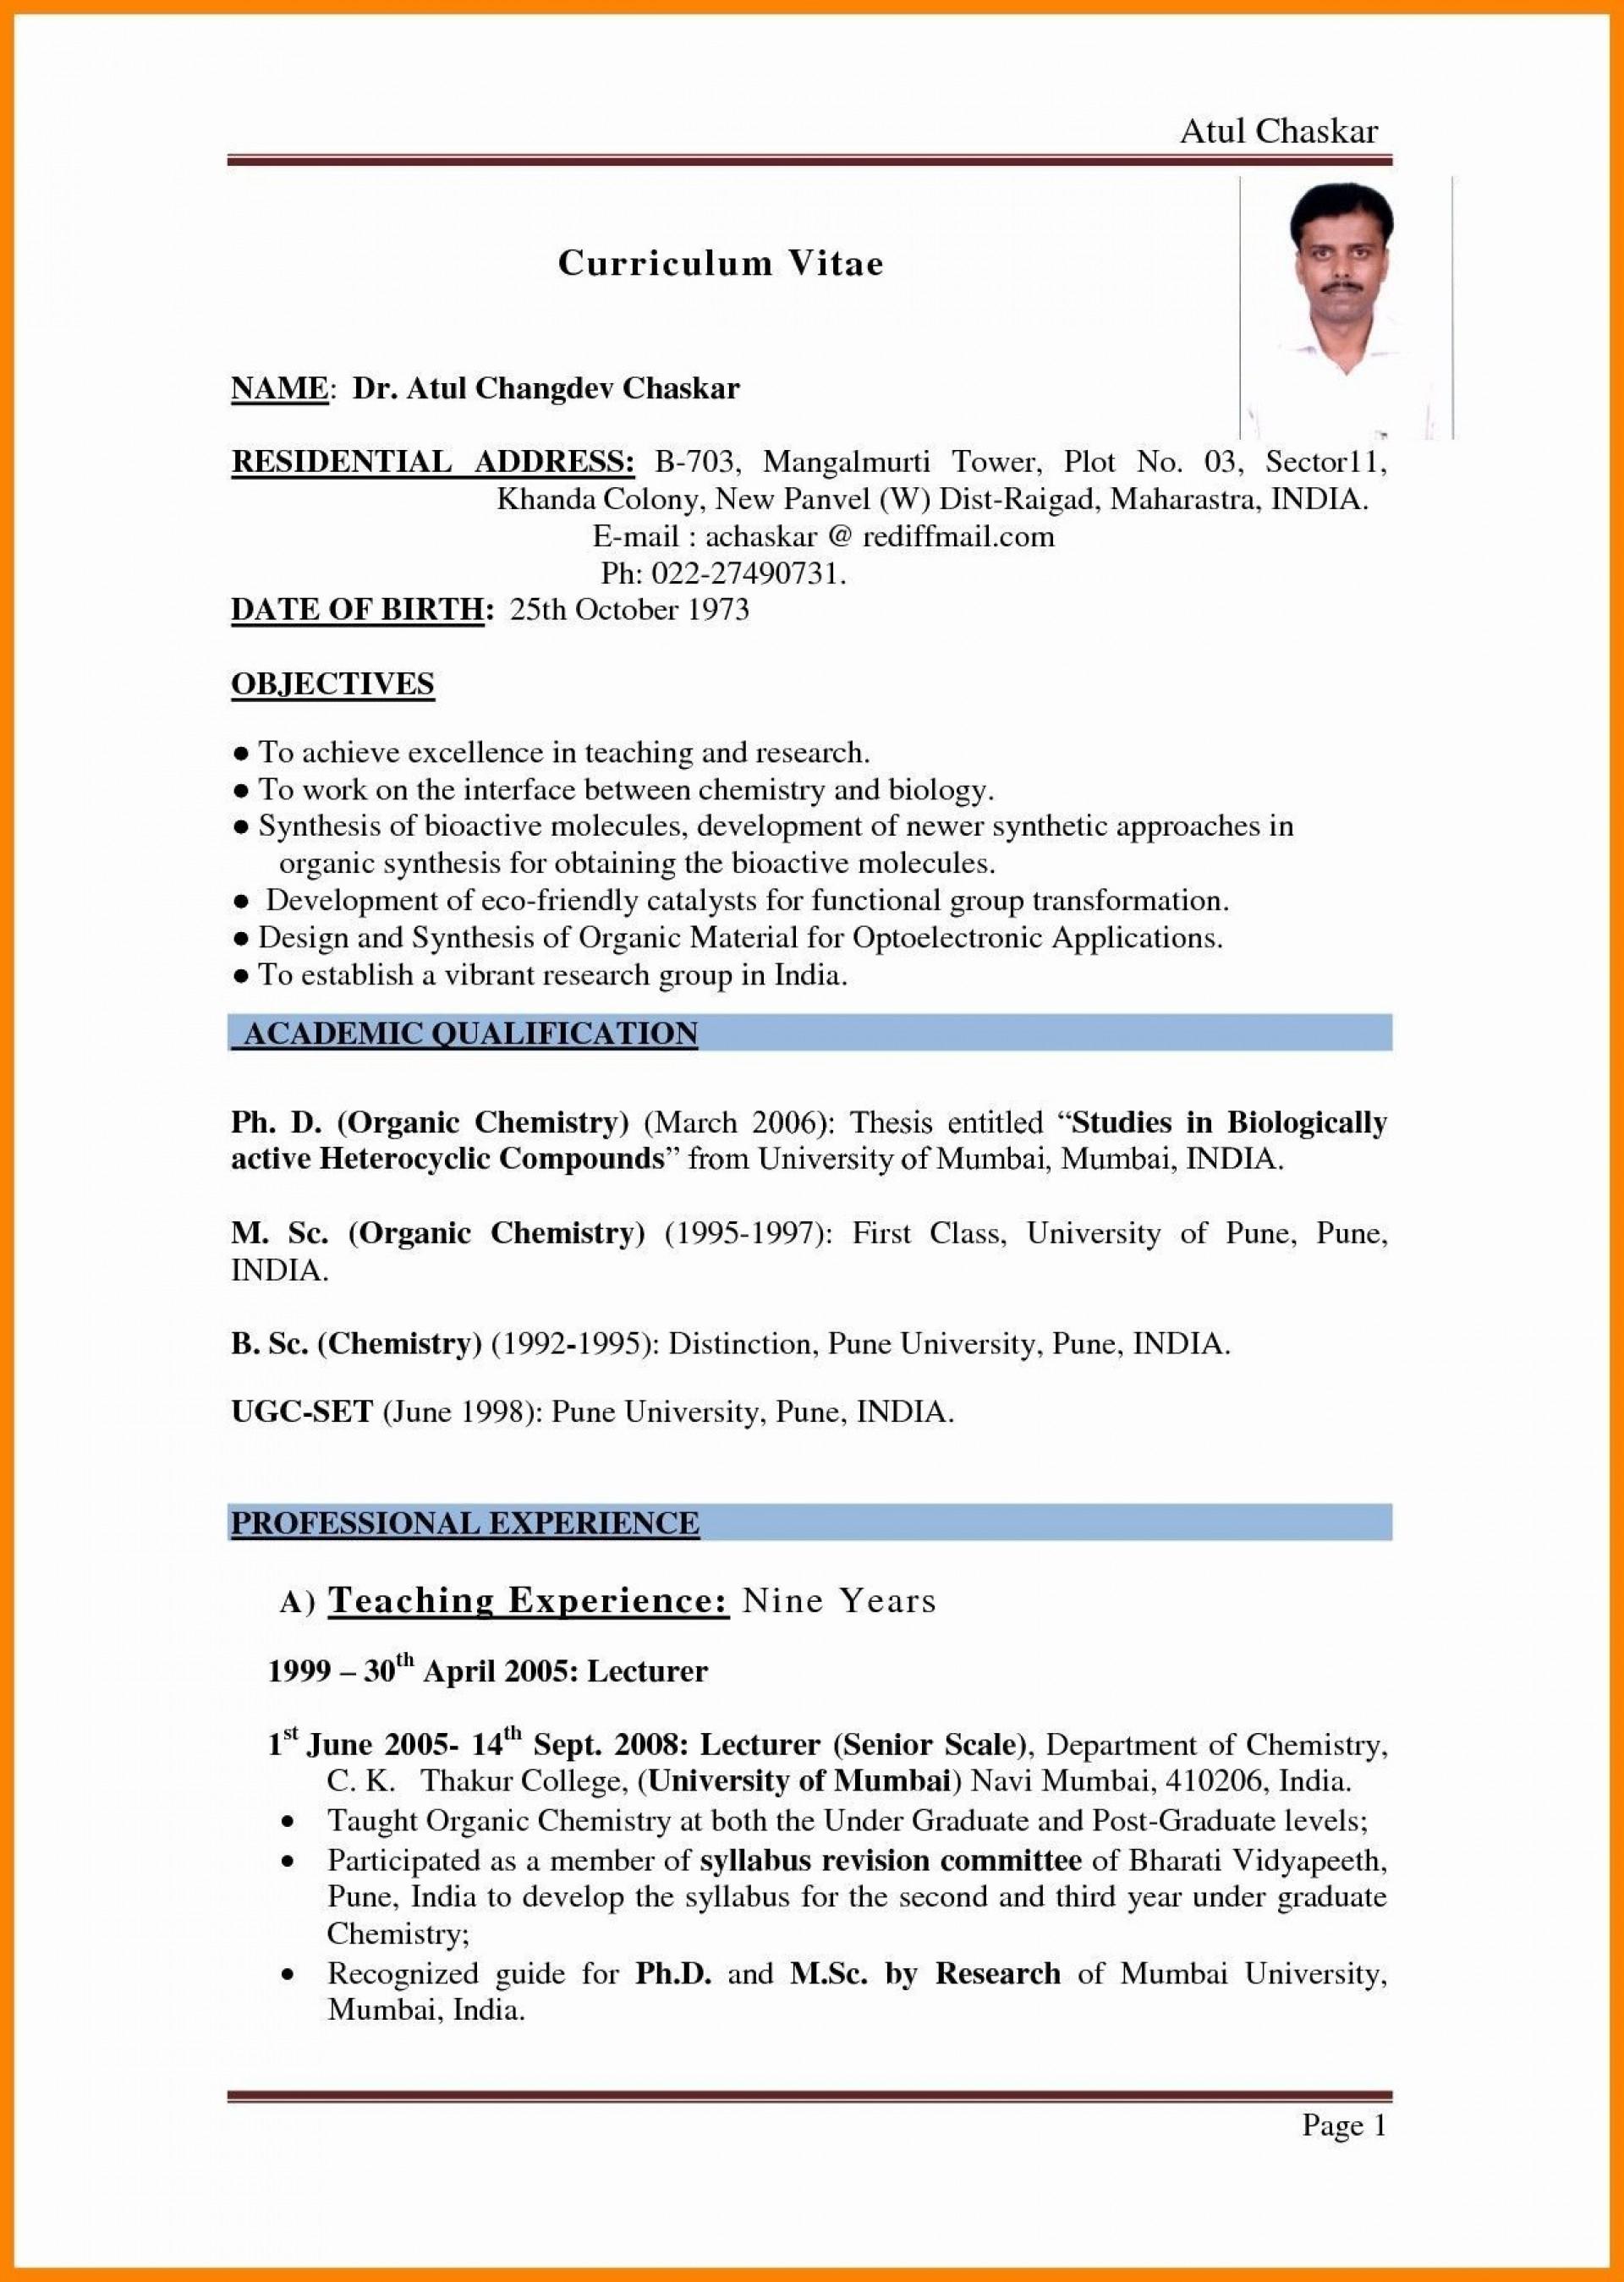 001 Beautiful Resume Sample For Teaching Job In India Image  School Principal Position1920